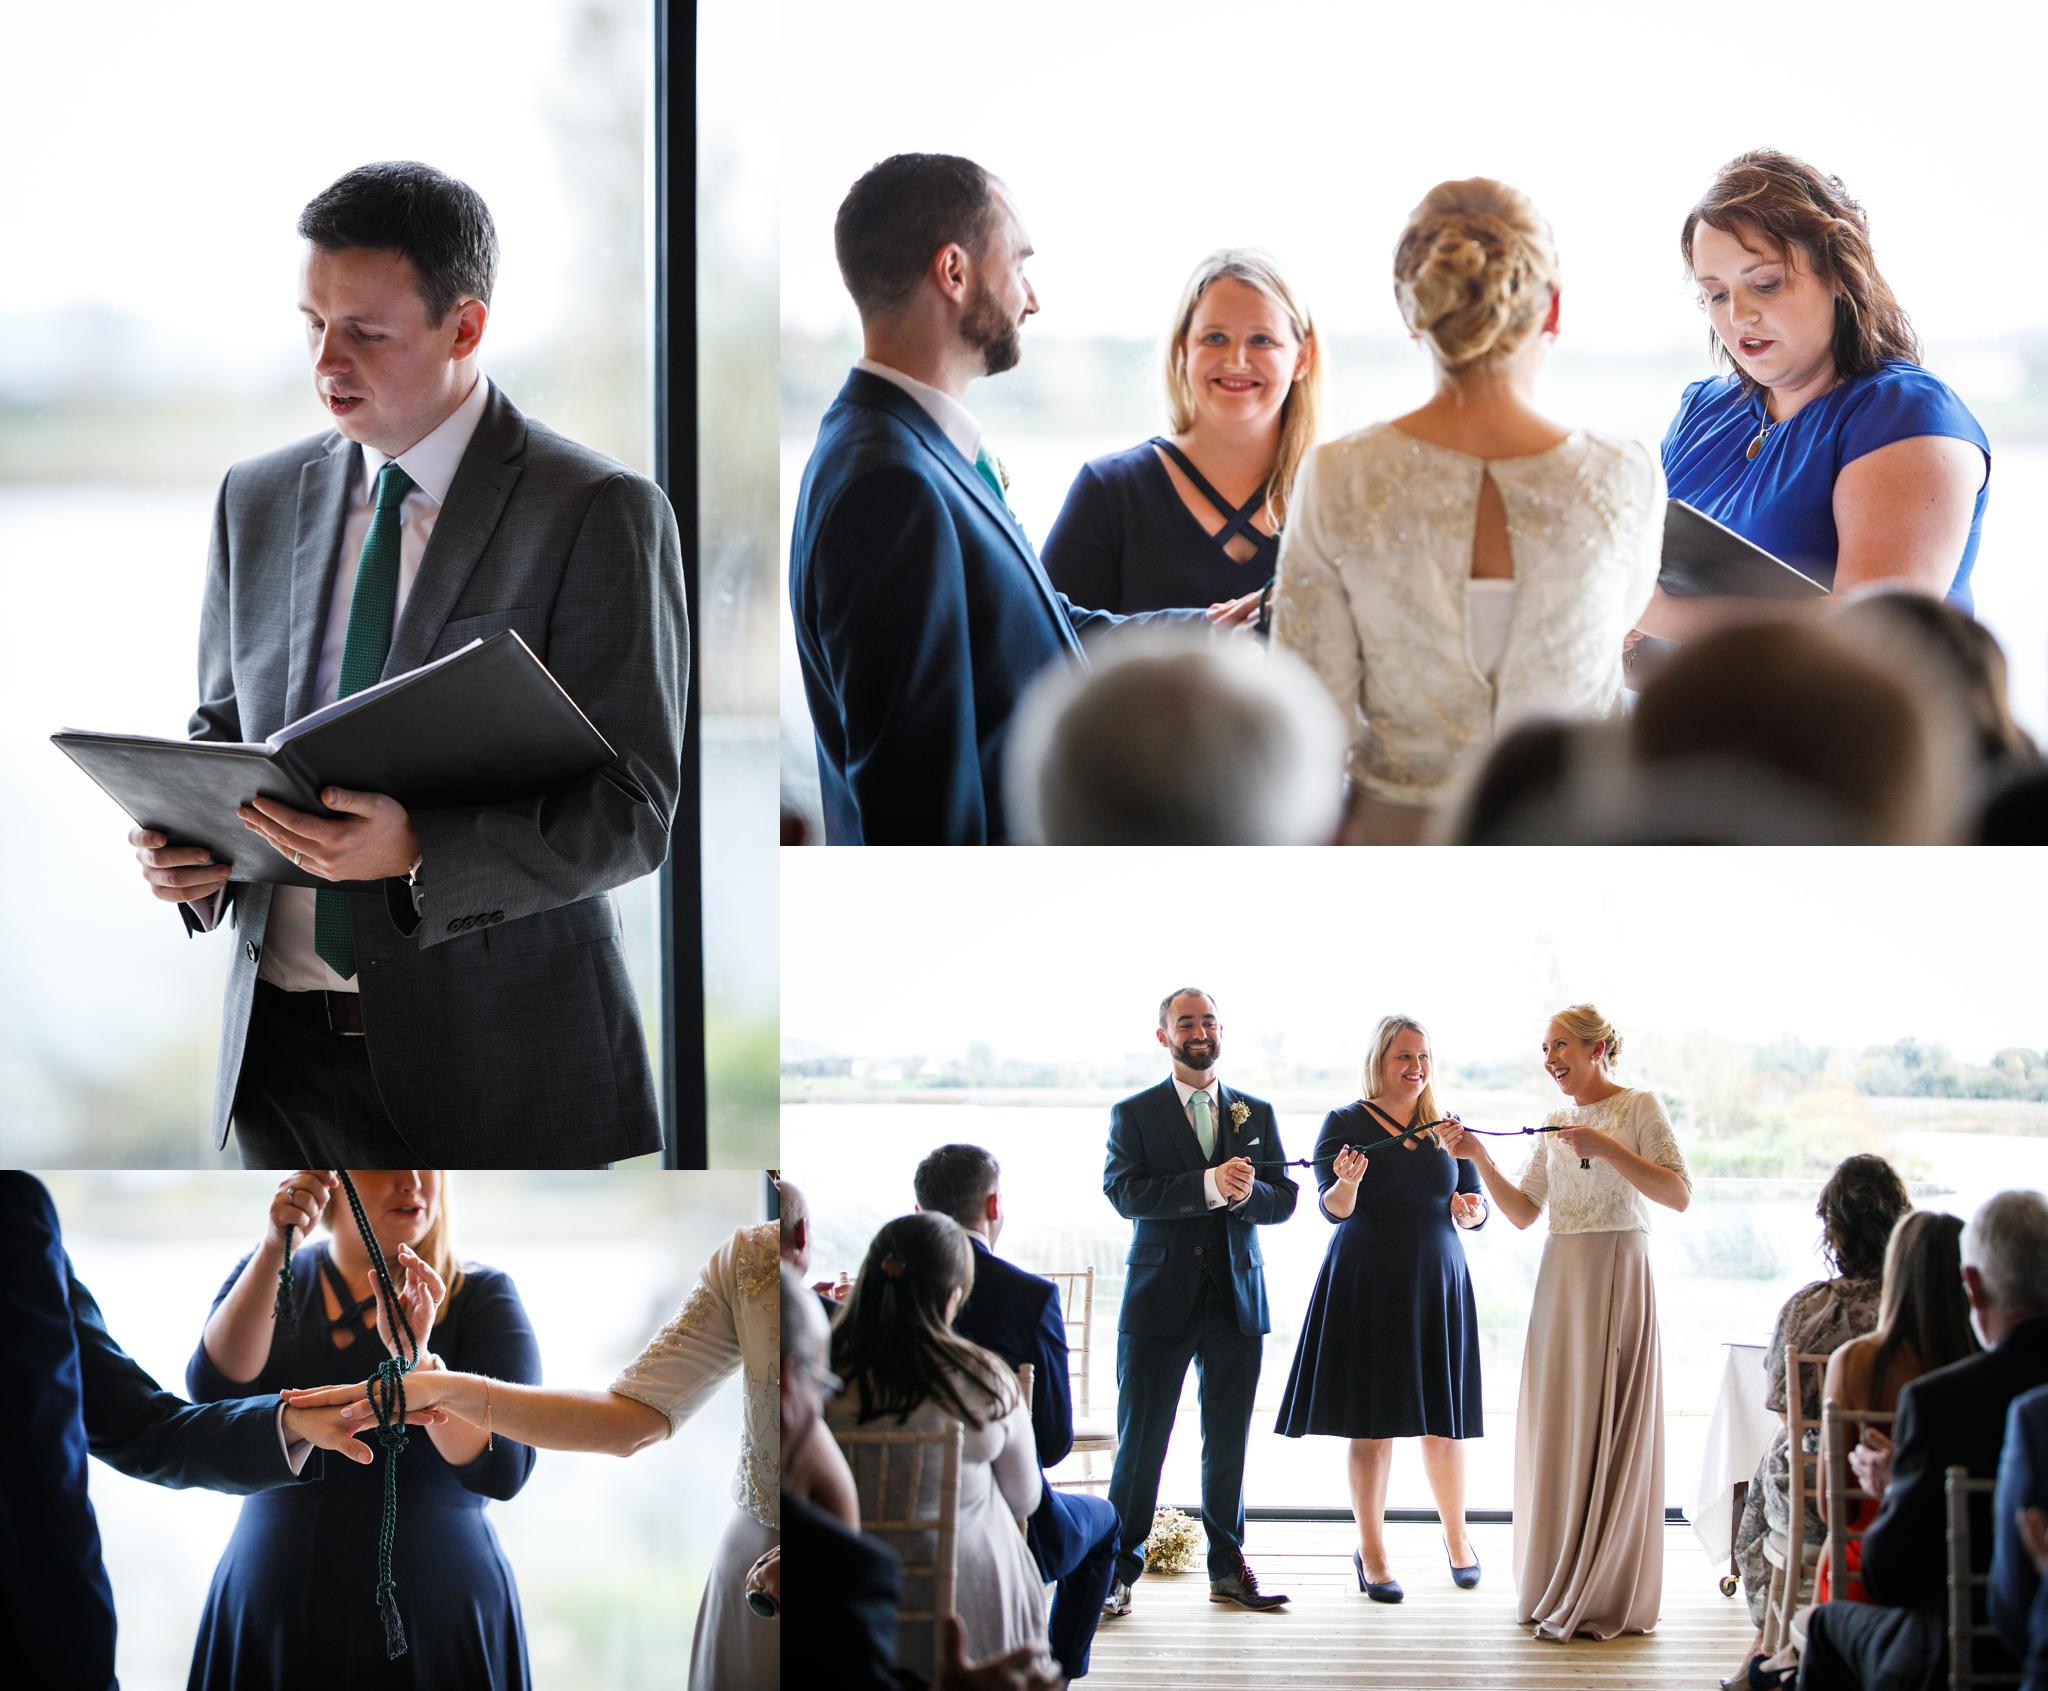 Elisha-Clarke-Photography-Dublin-City-Wedding_0071.jpg